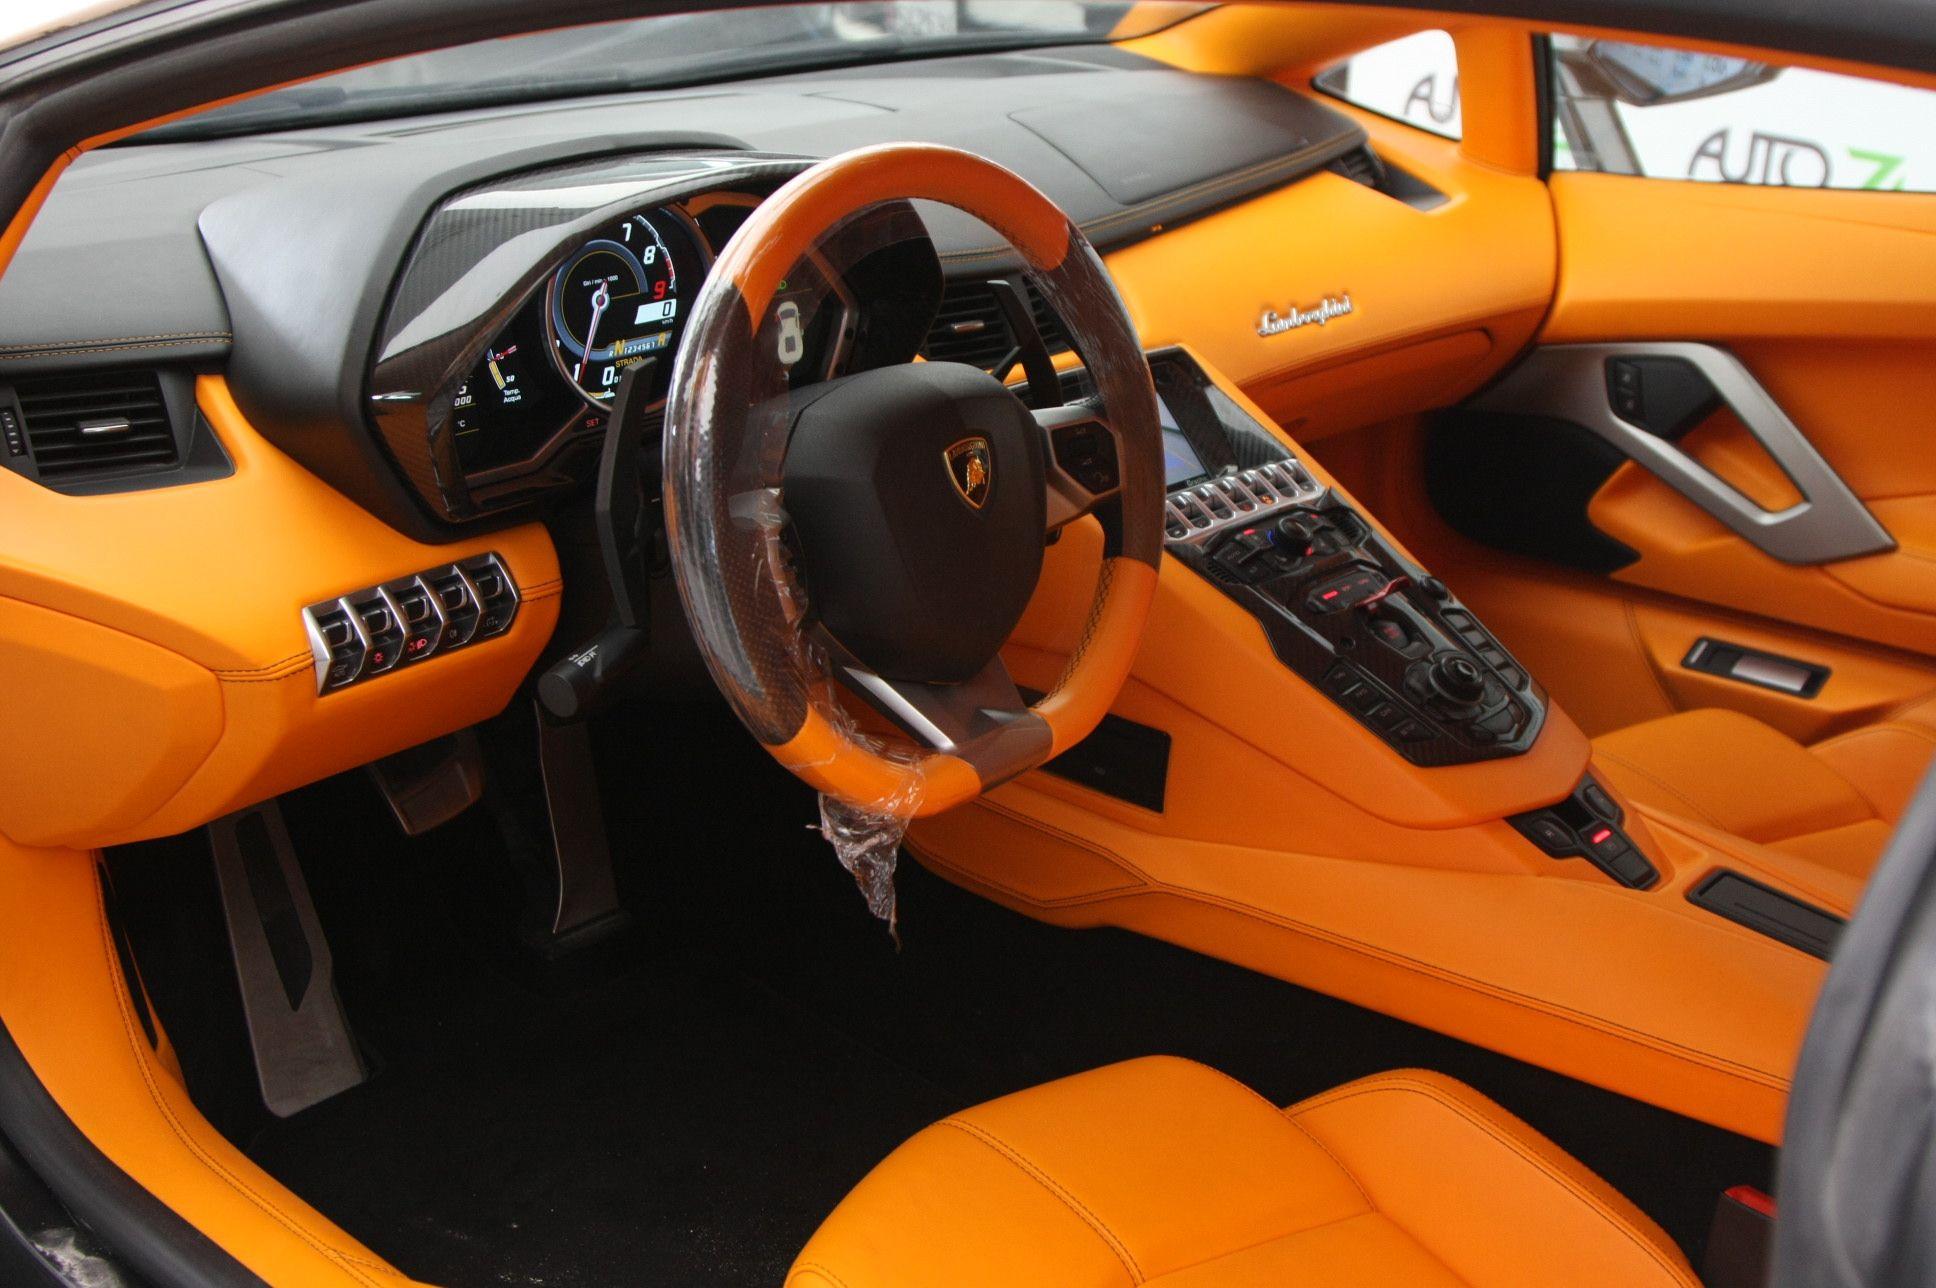 Lamborghini Aventador orange and black arancia interior | Auto ...